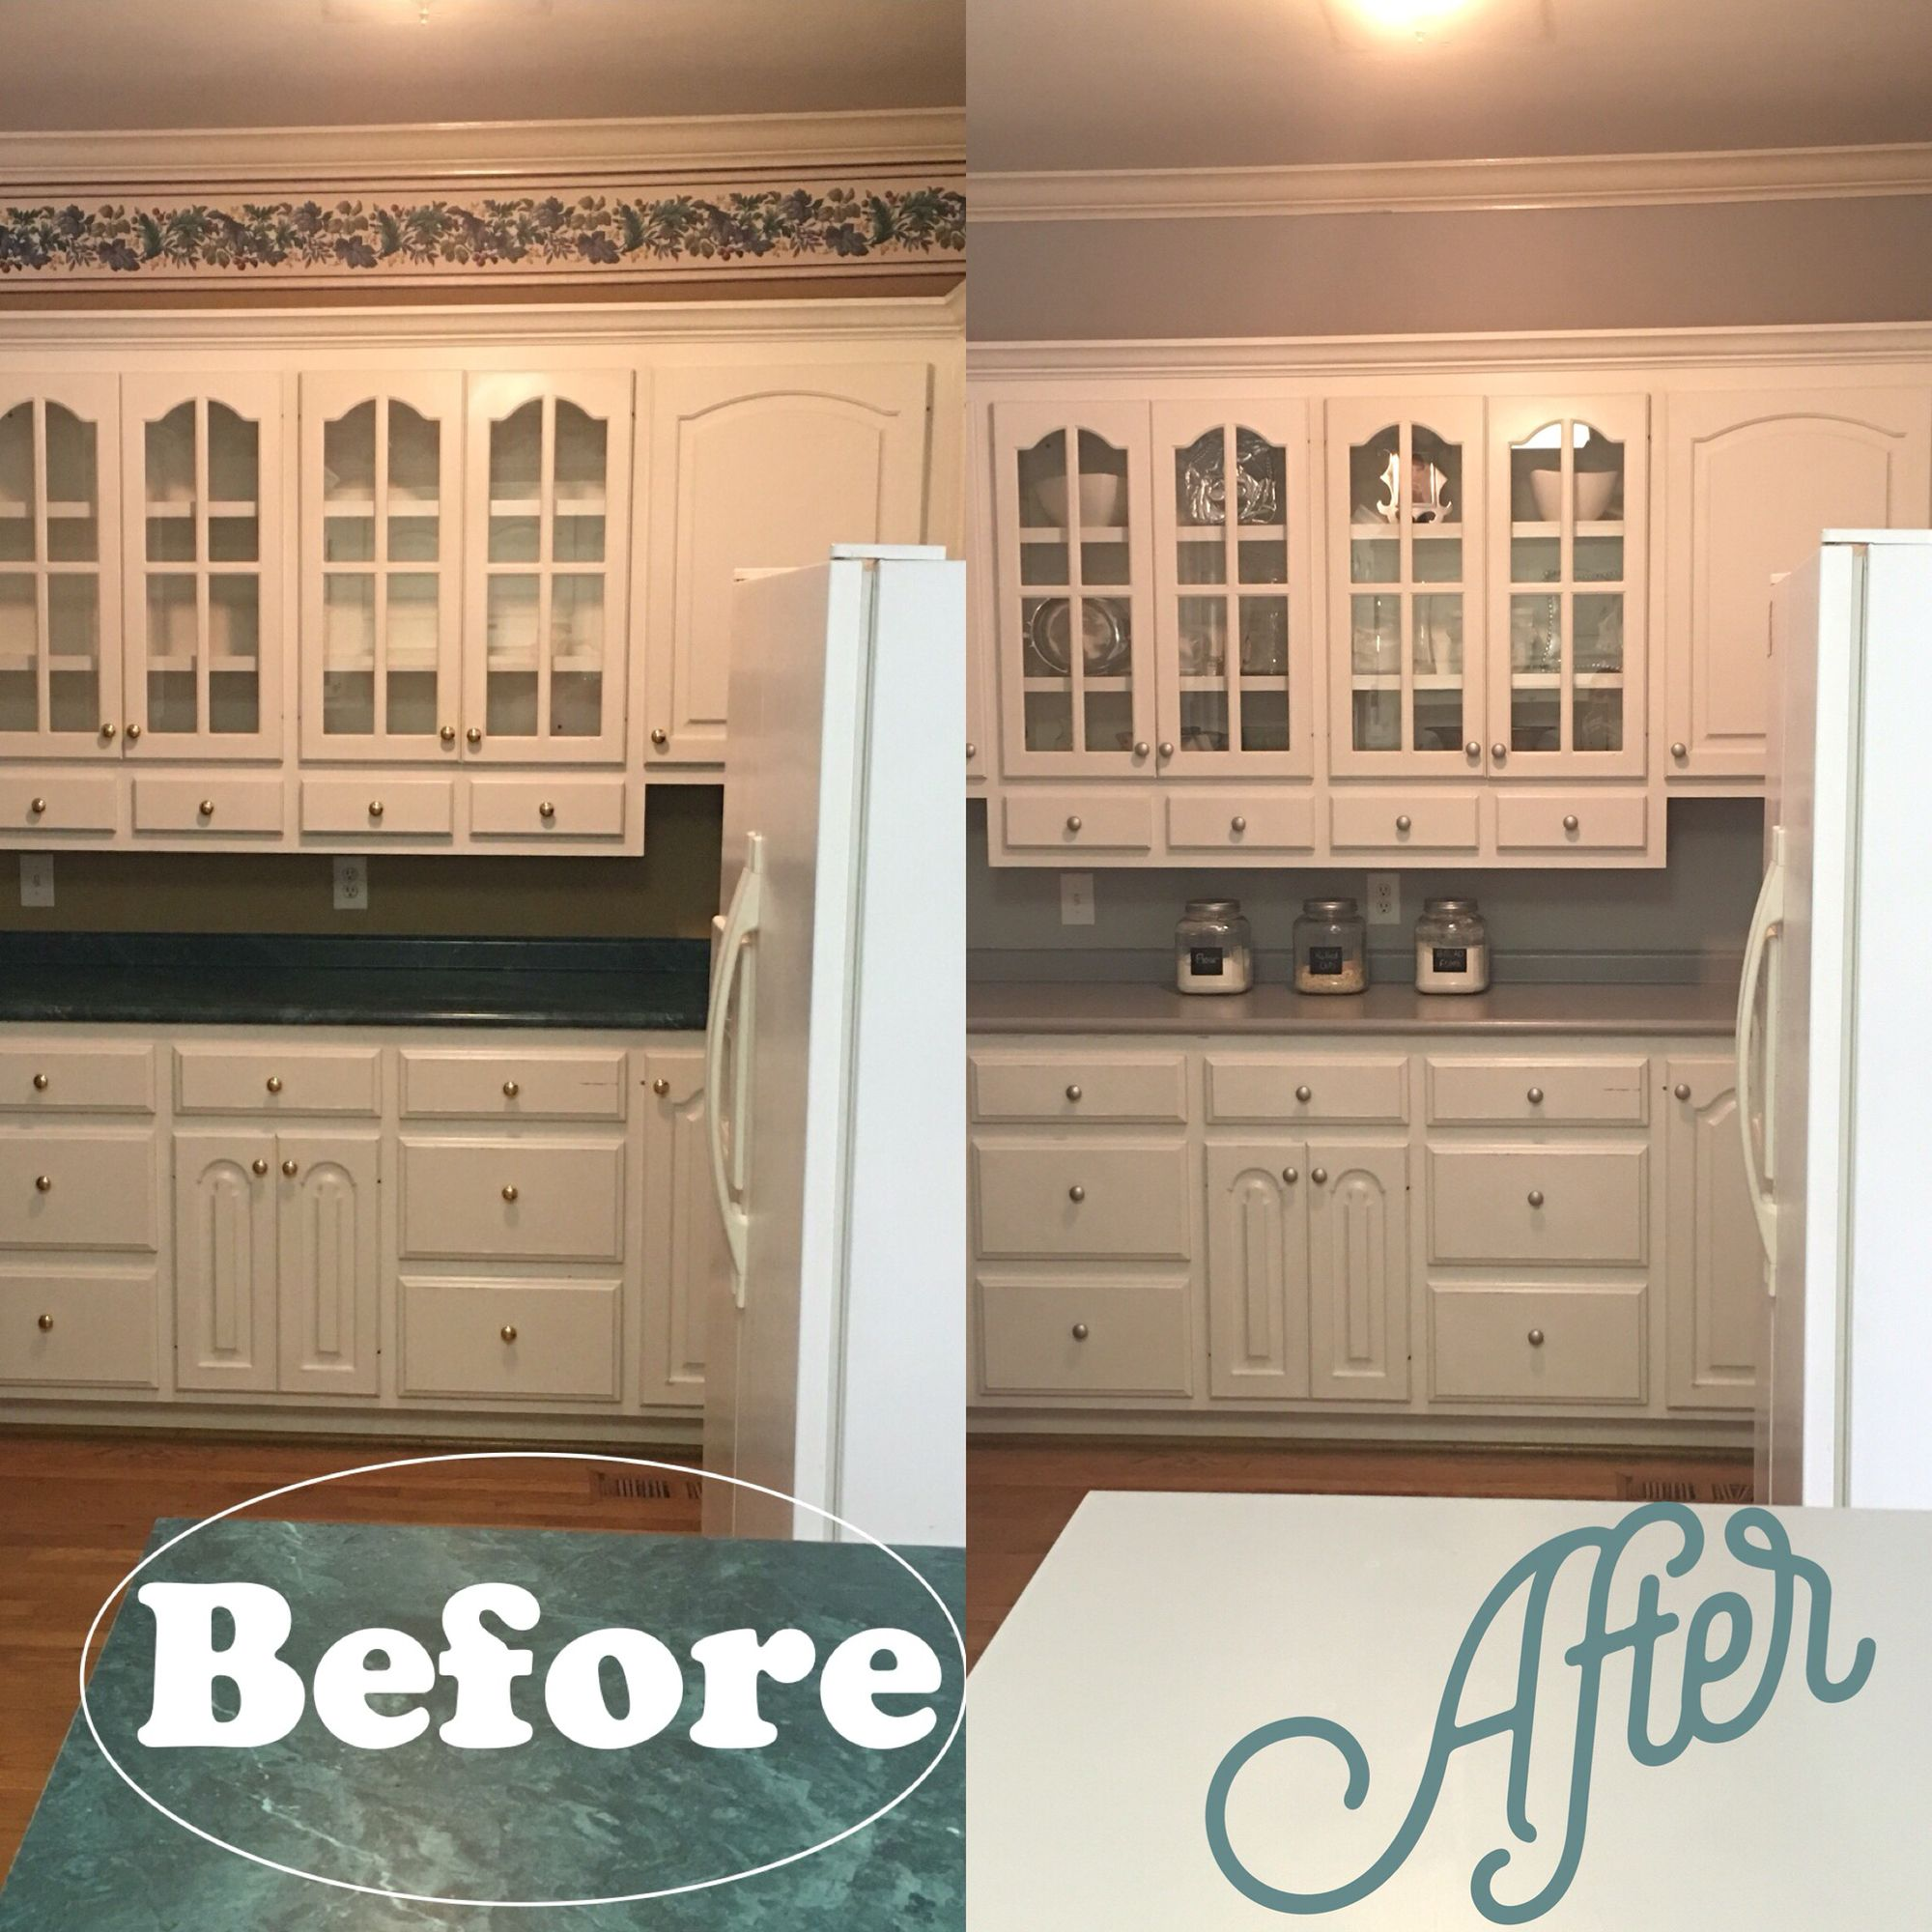 Uncategorized Rustoleum Kitchen Countertop Paint kitchen transformation its all paint cheap easy rustoleum countertop in grey